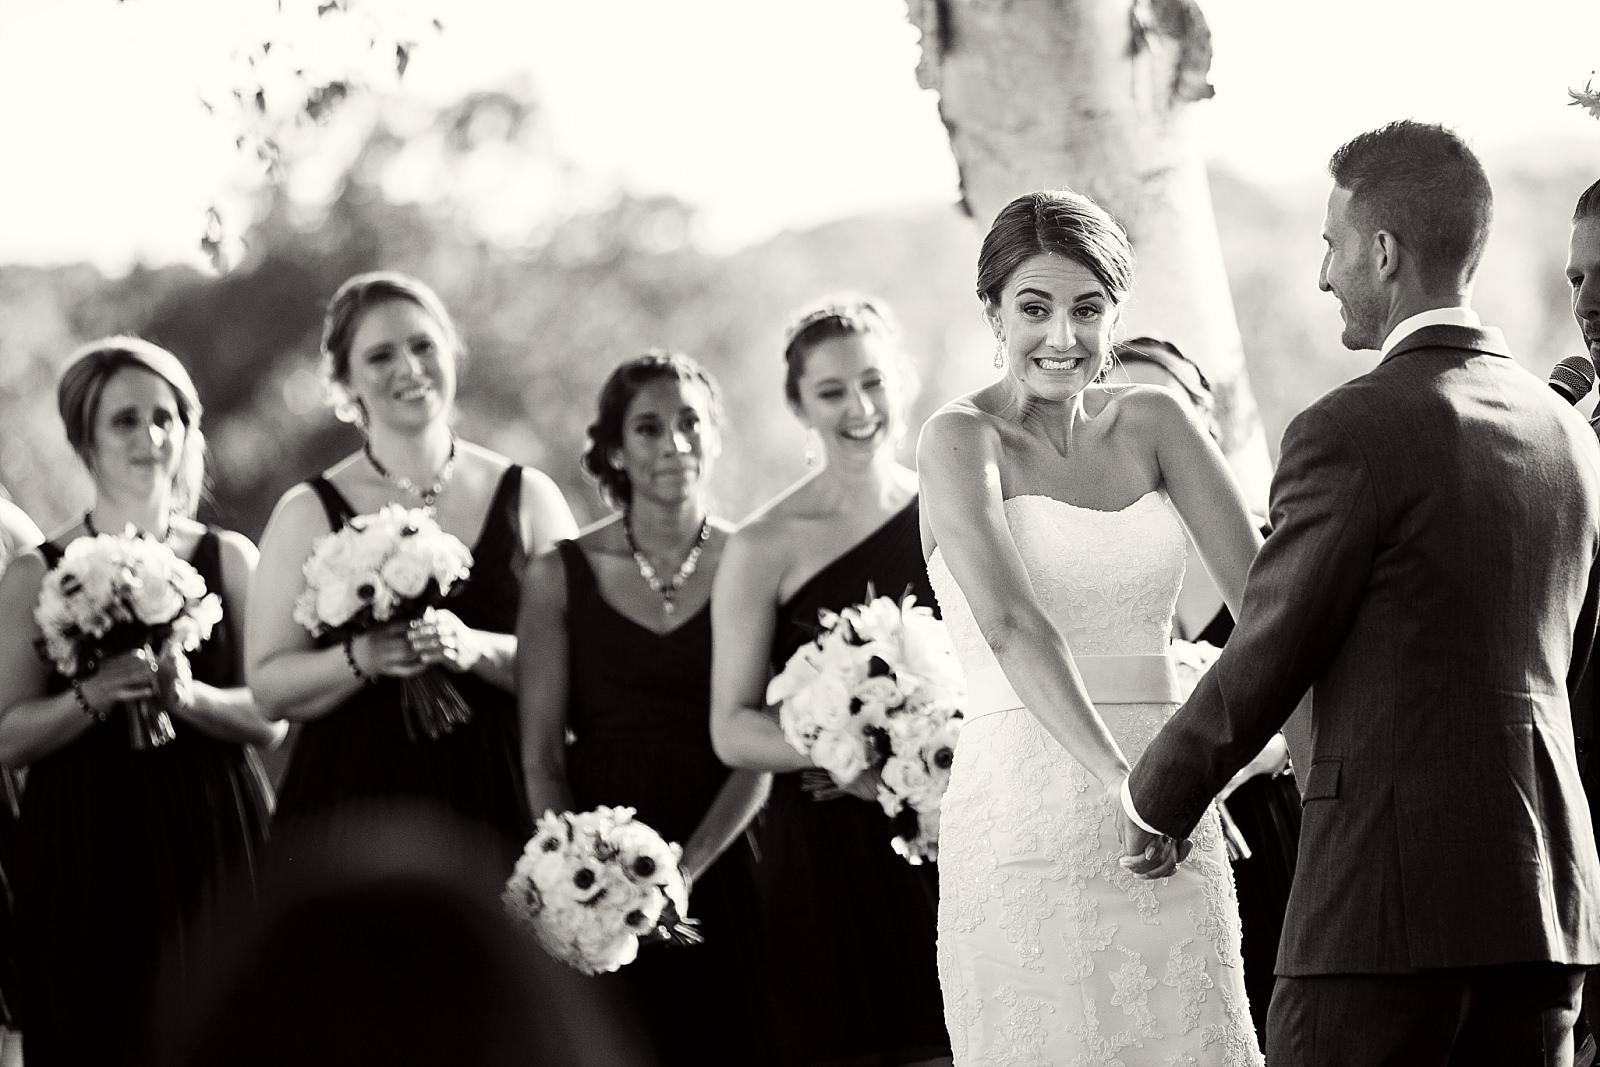 CT_Wedding_Photographer_LiNa_Wed_48.jpg